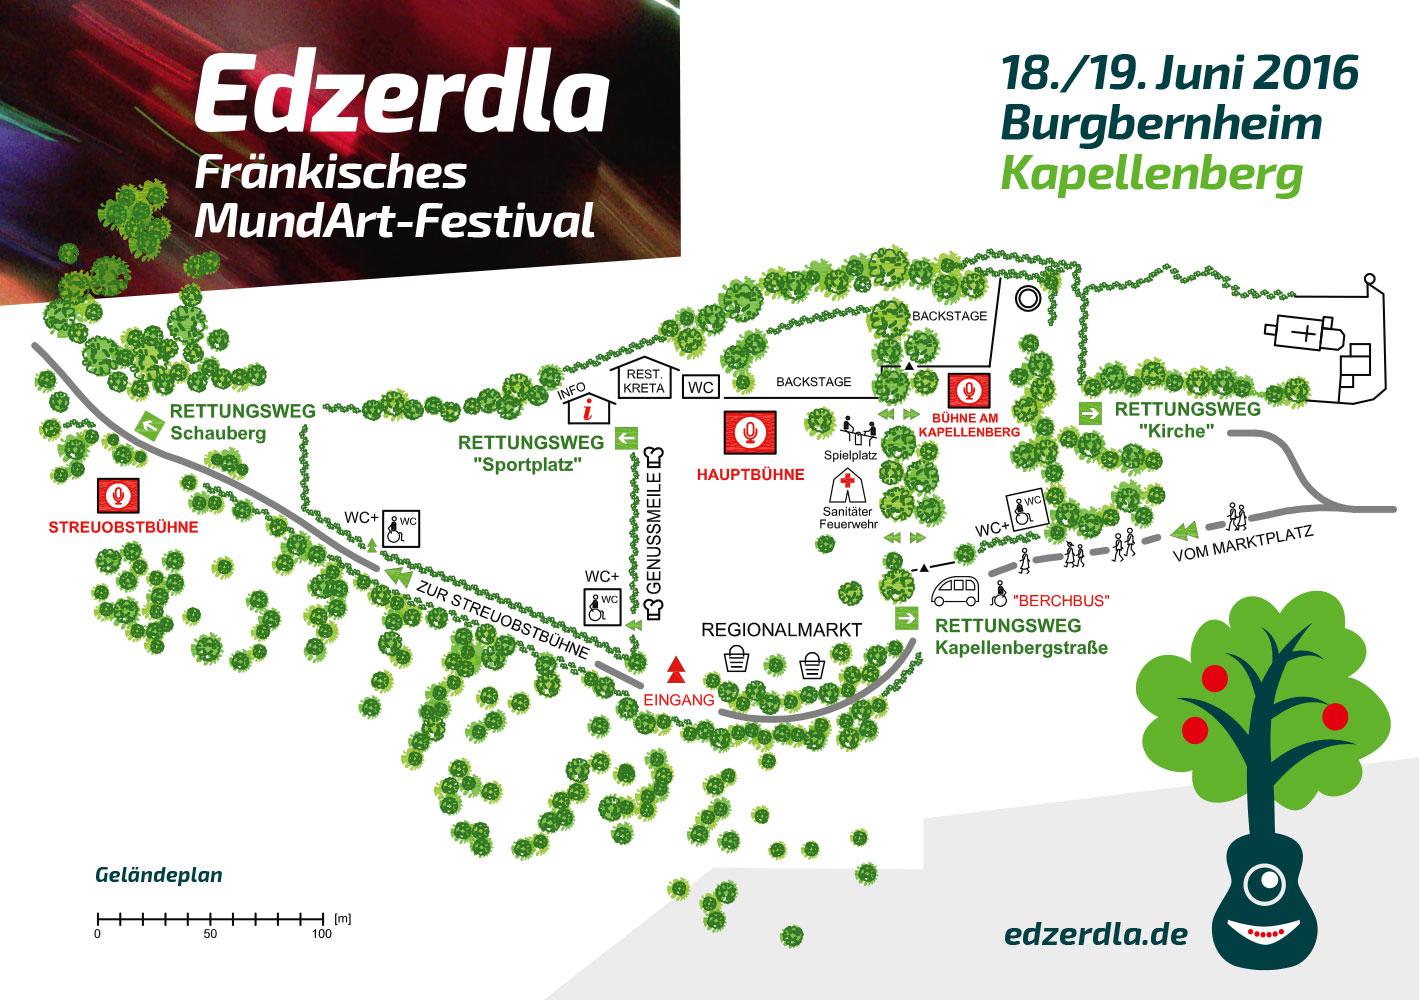 Lageplan Edzerdla MundArt-Festival